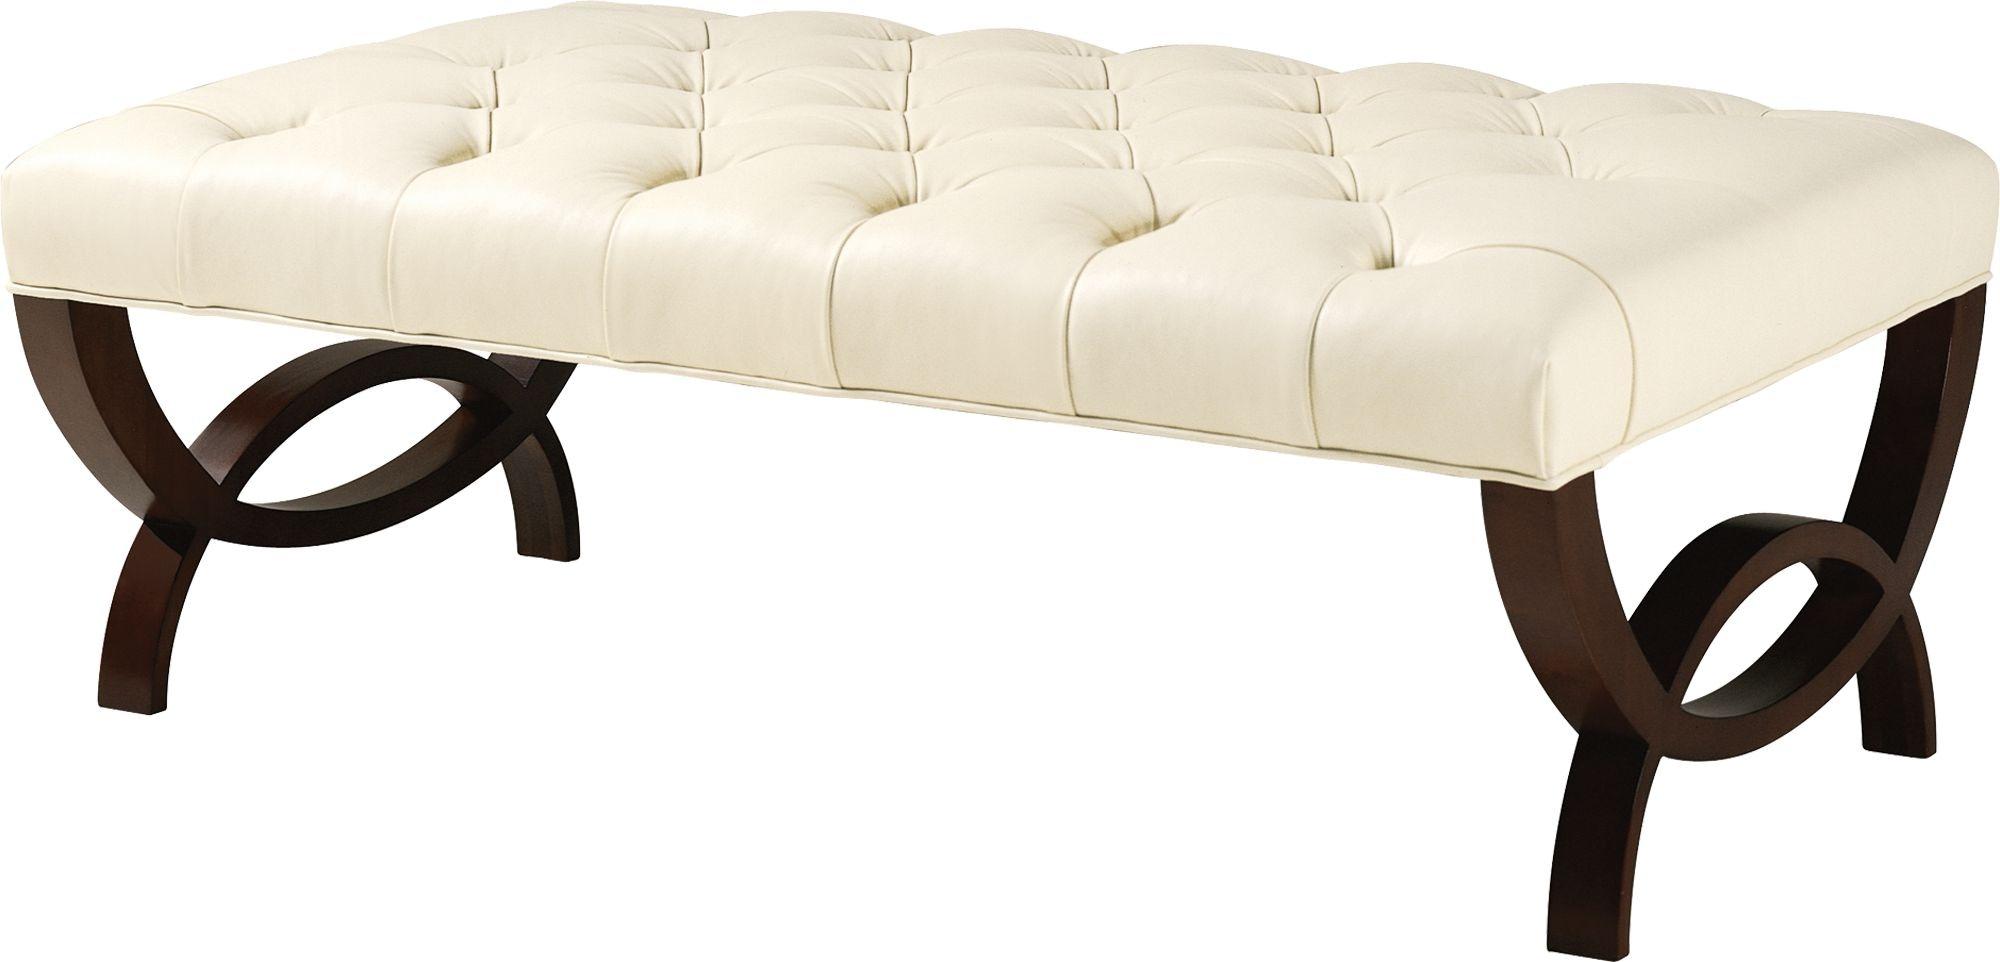 ottoman designs furniture. Baker Furniture Thomas Pheasant|Baker Designer Upholstery Directoire Ottoman 6336 Designs